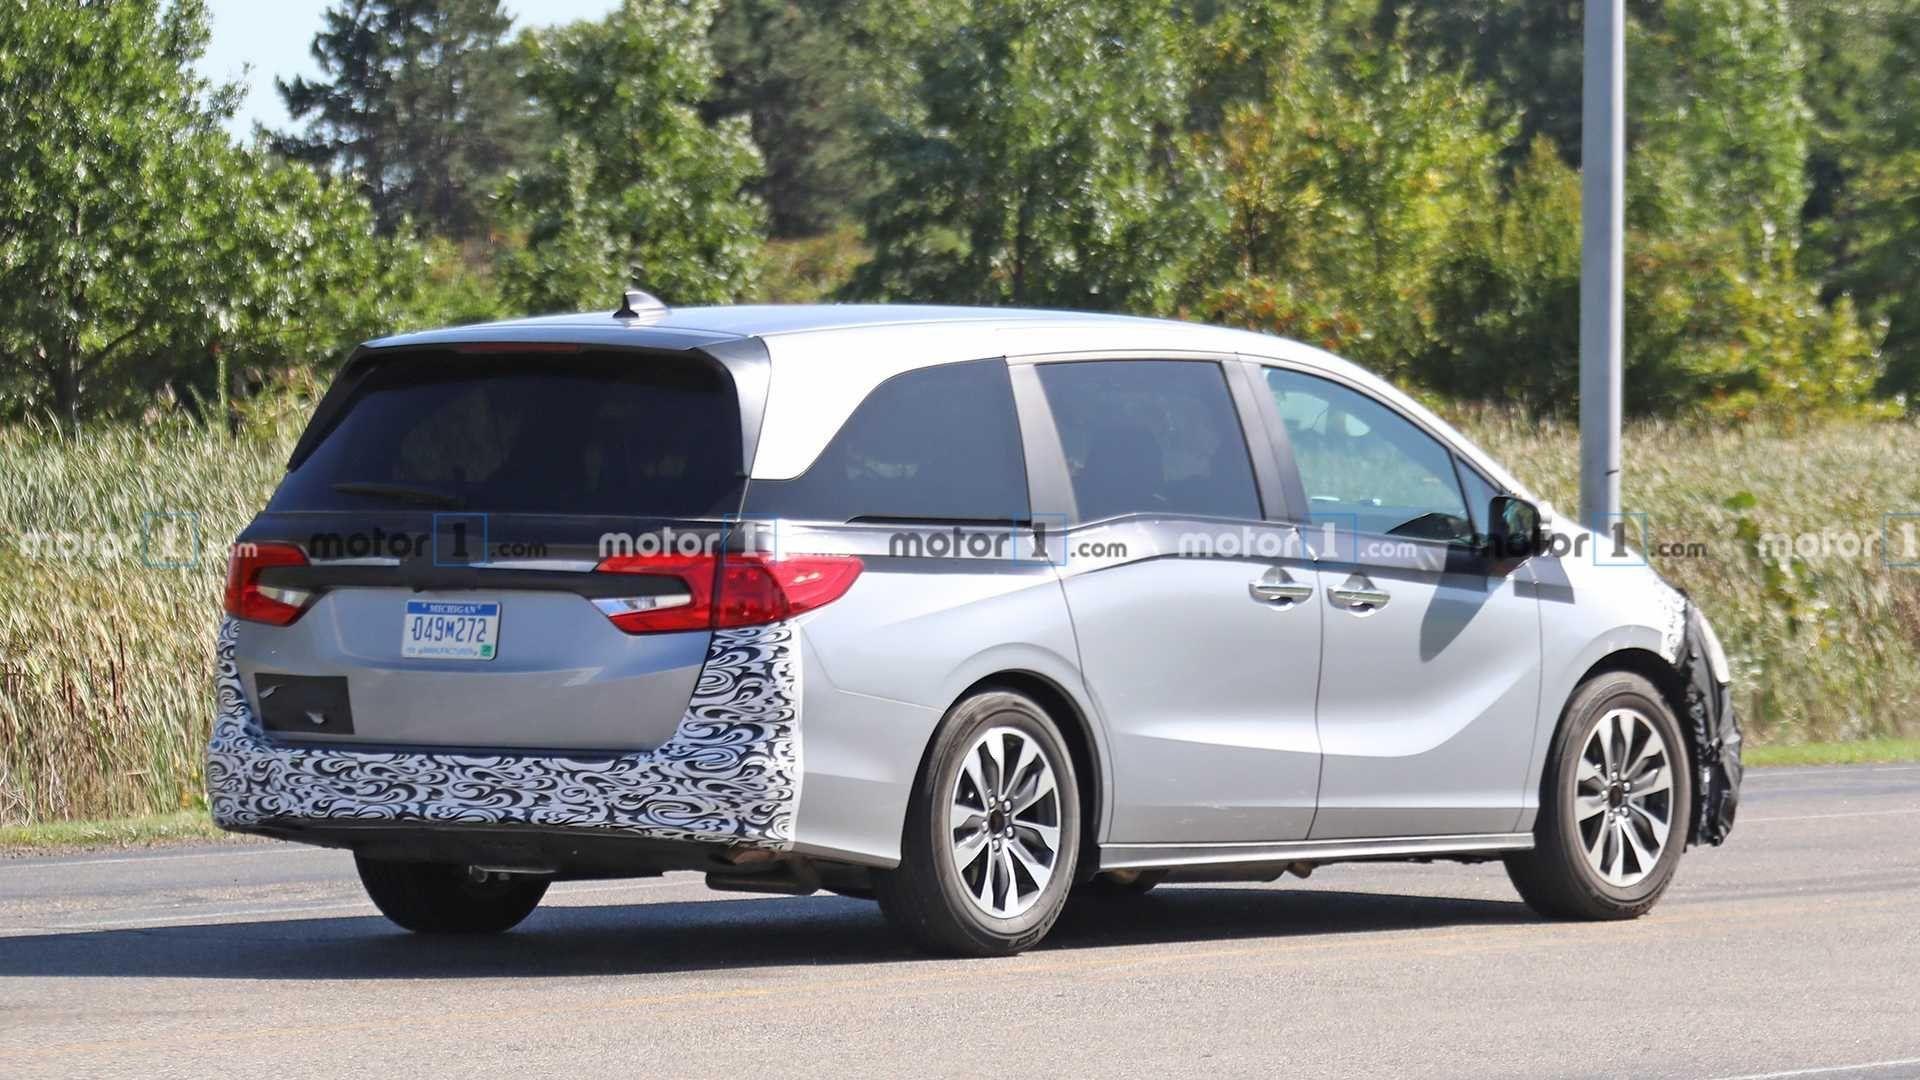 2021 Honda Element Review in 2020 | Honda odyssey, Toyota ...